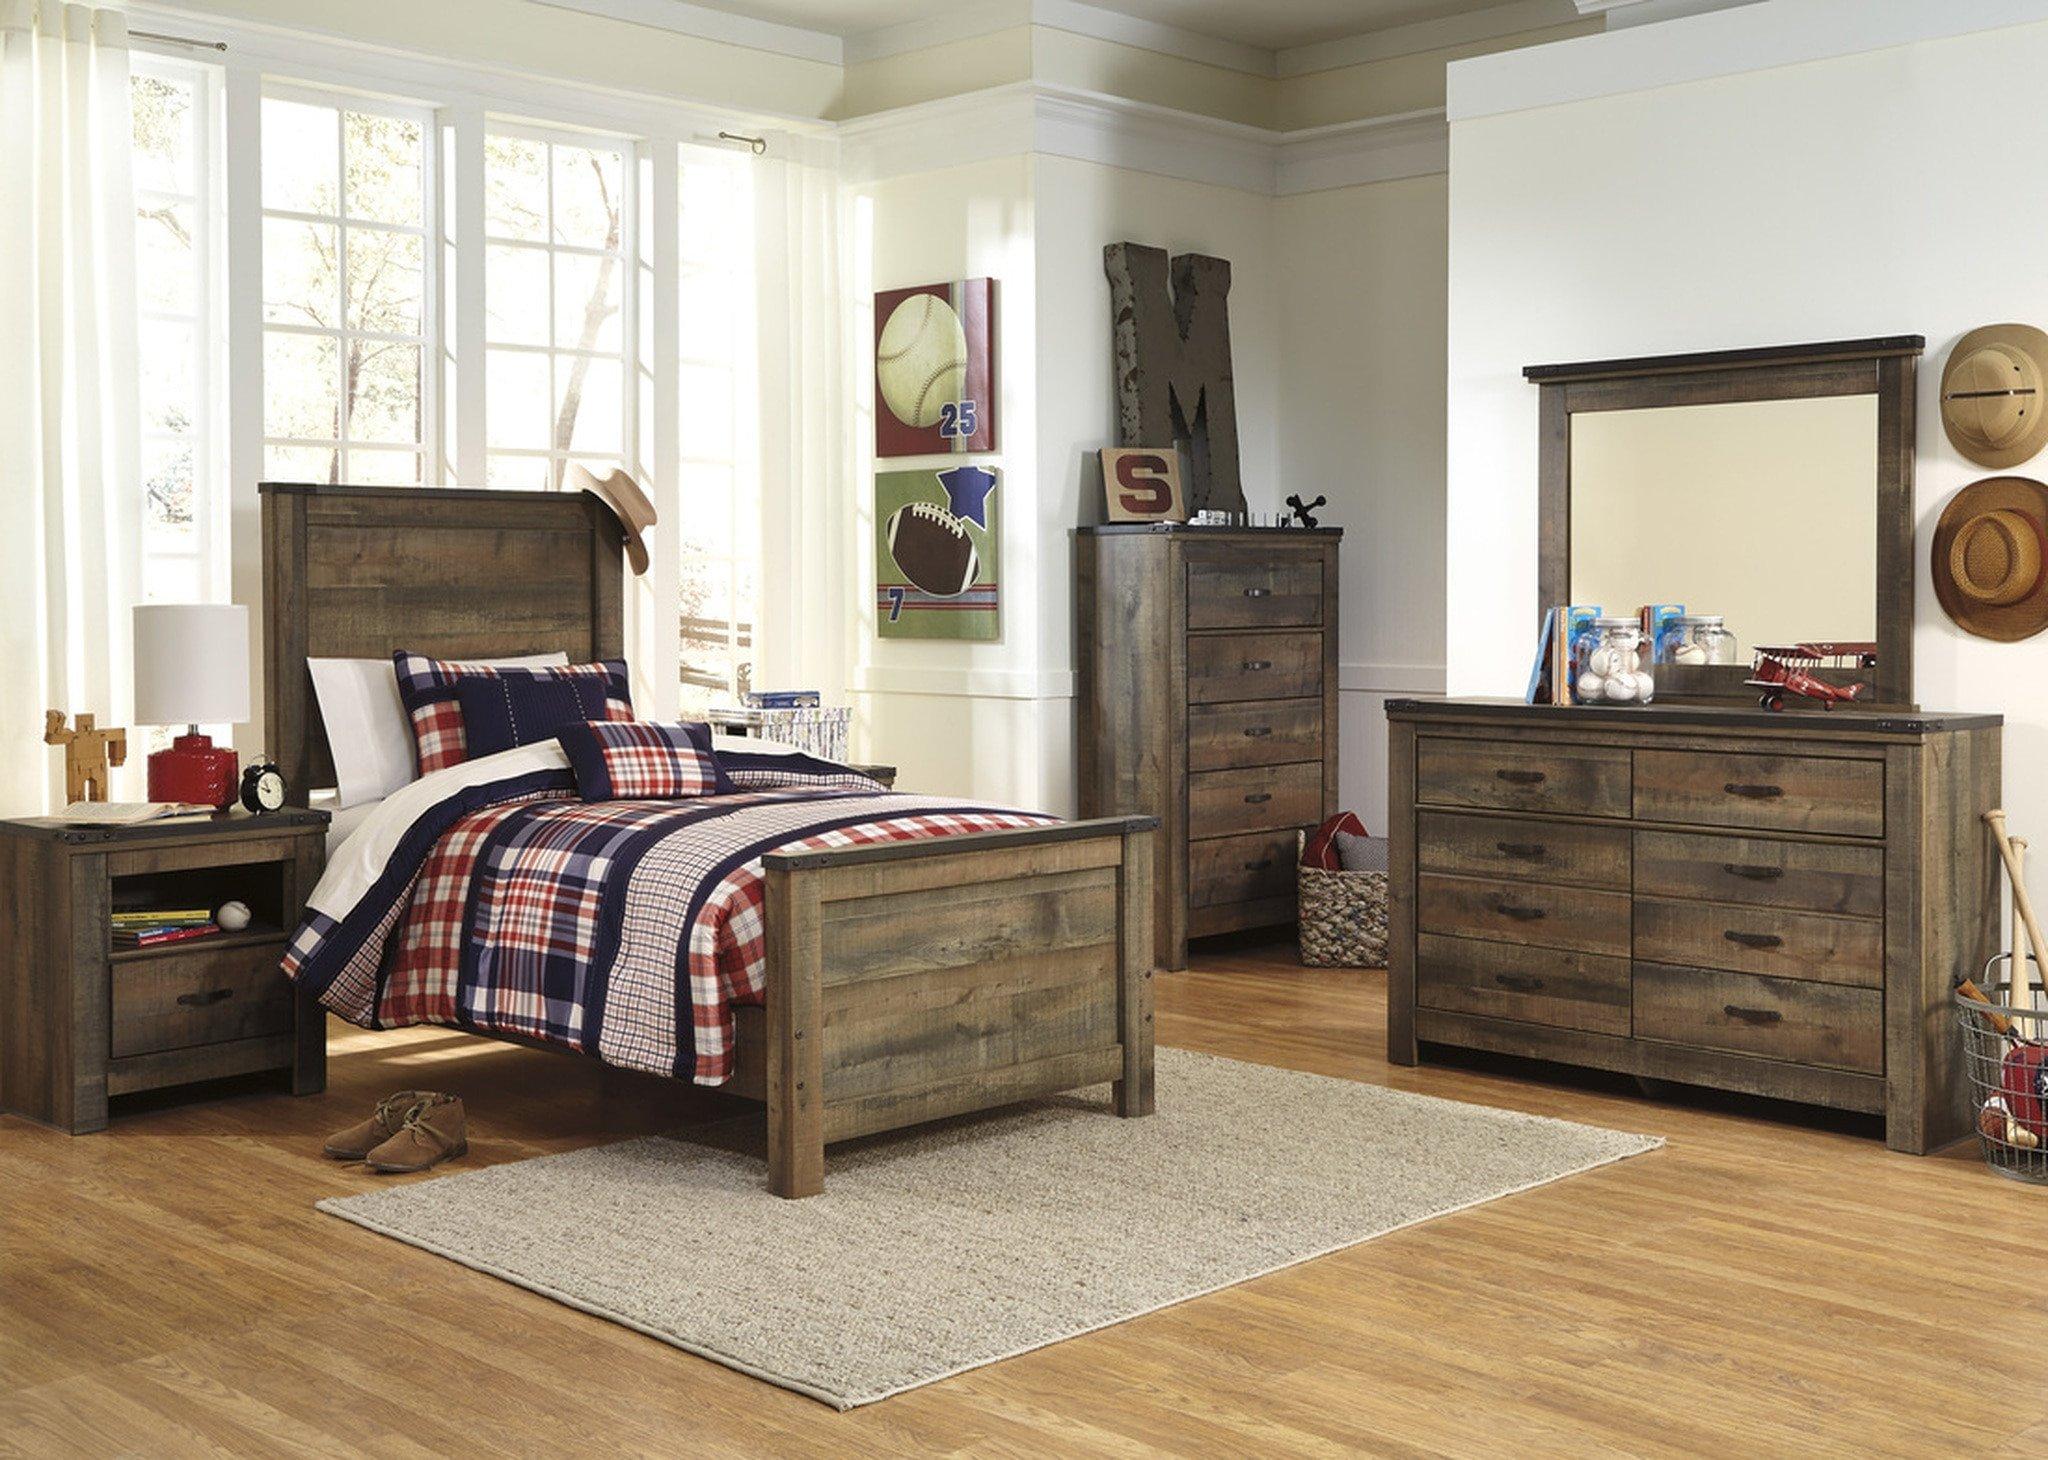 Ashley Catalina Bedroom Set Luxury ashley Bedroom Collection